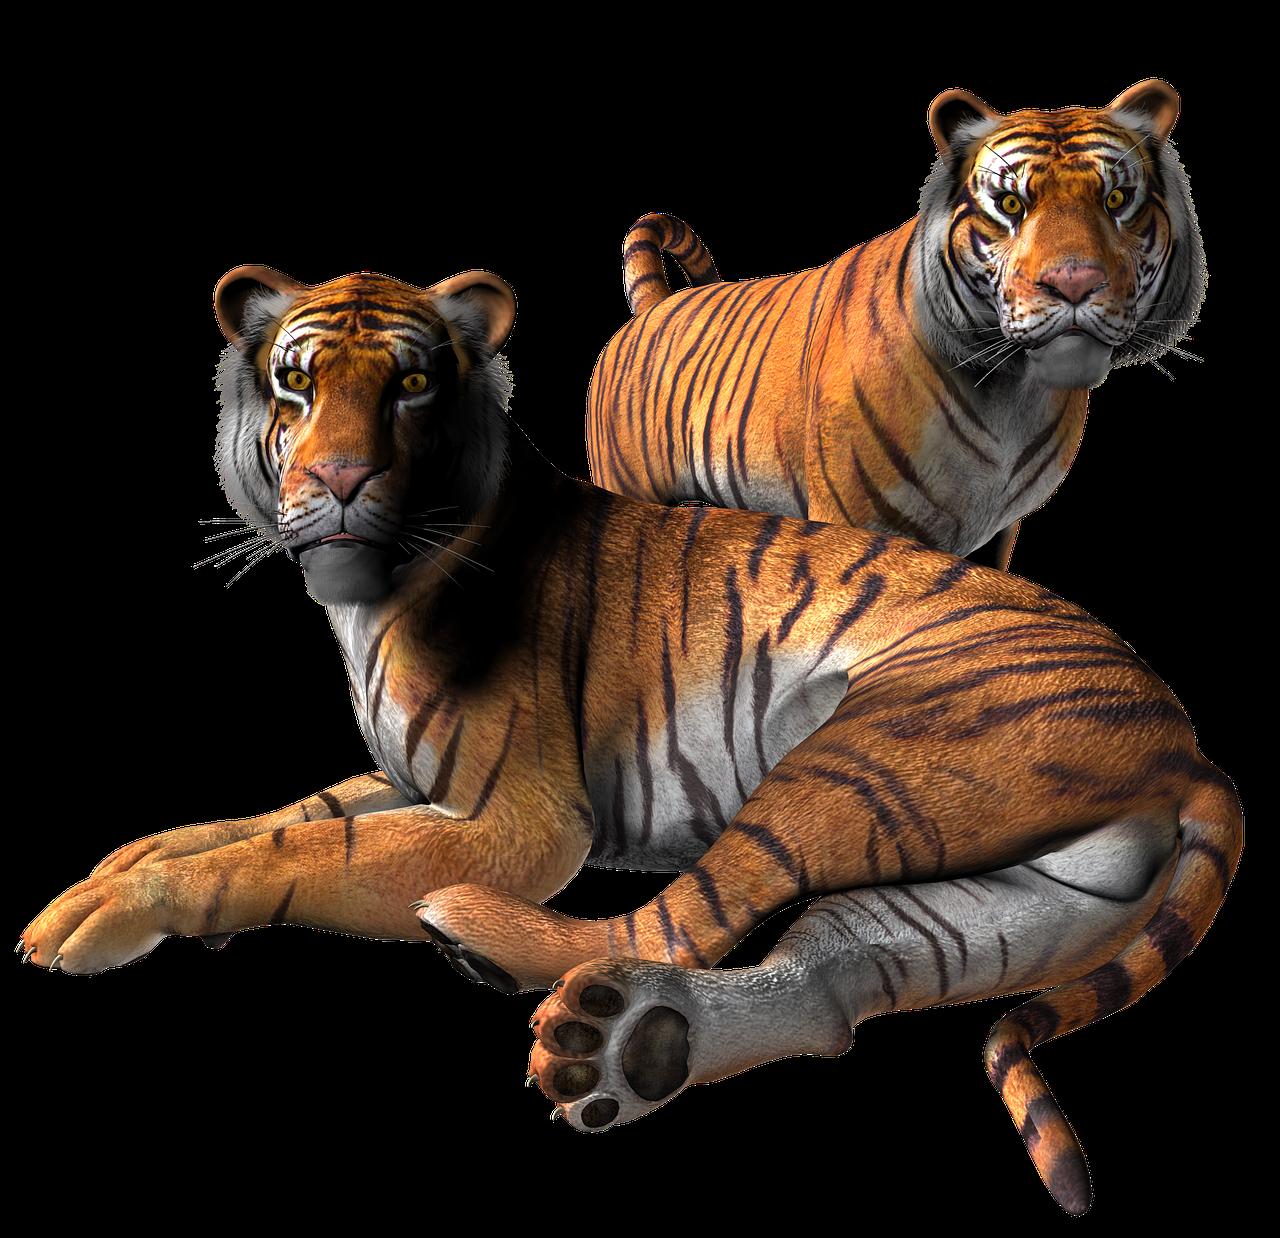 Tiger Animal Cat Free Image On Pixabay